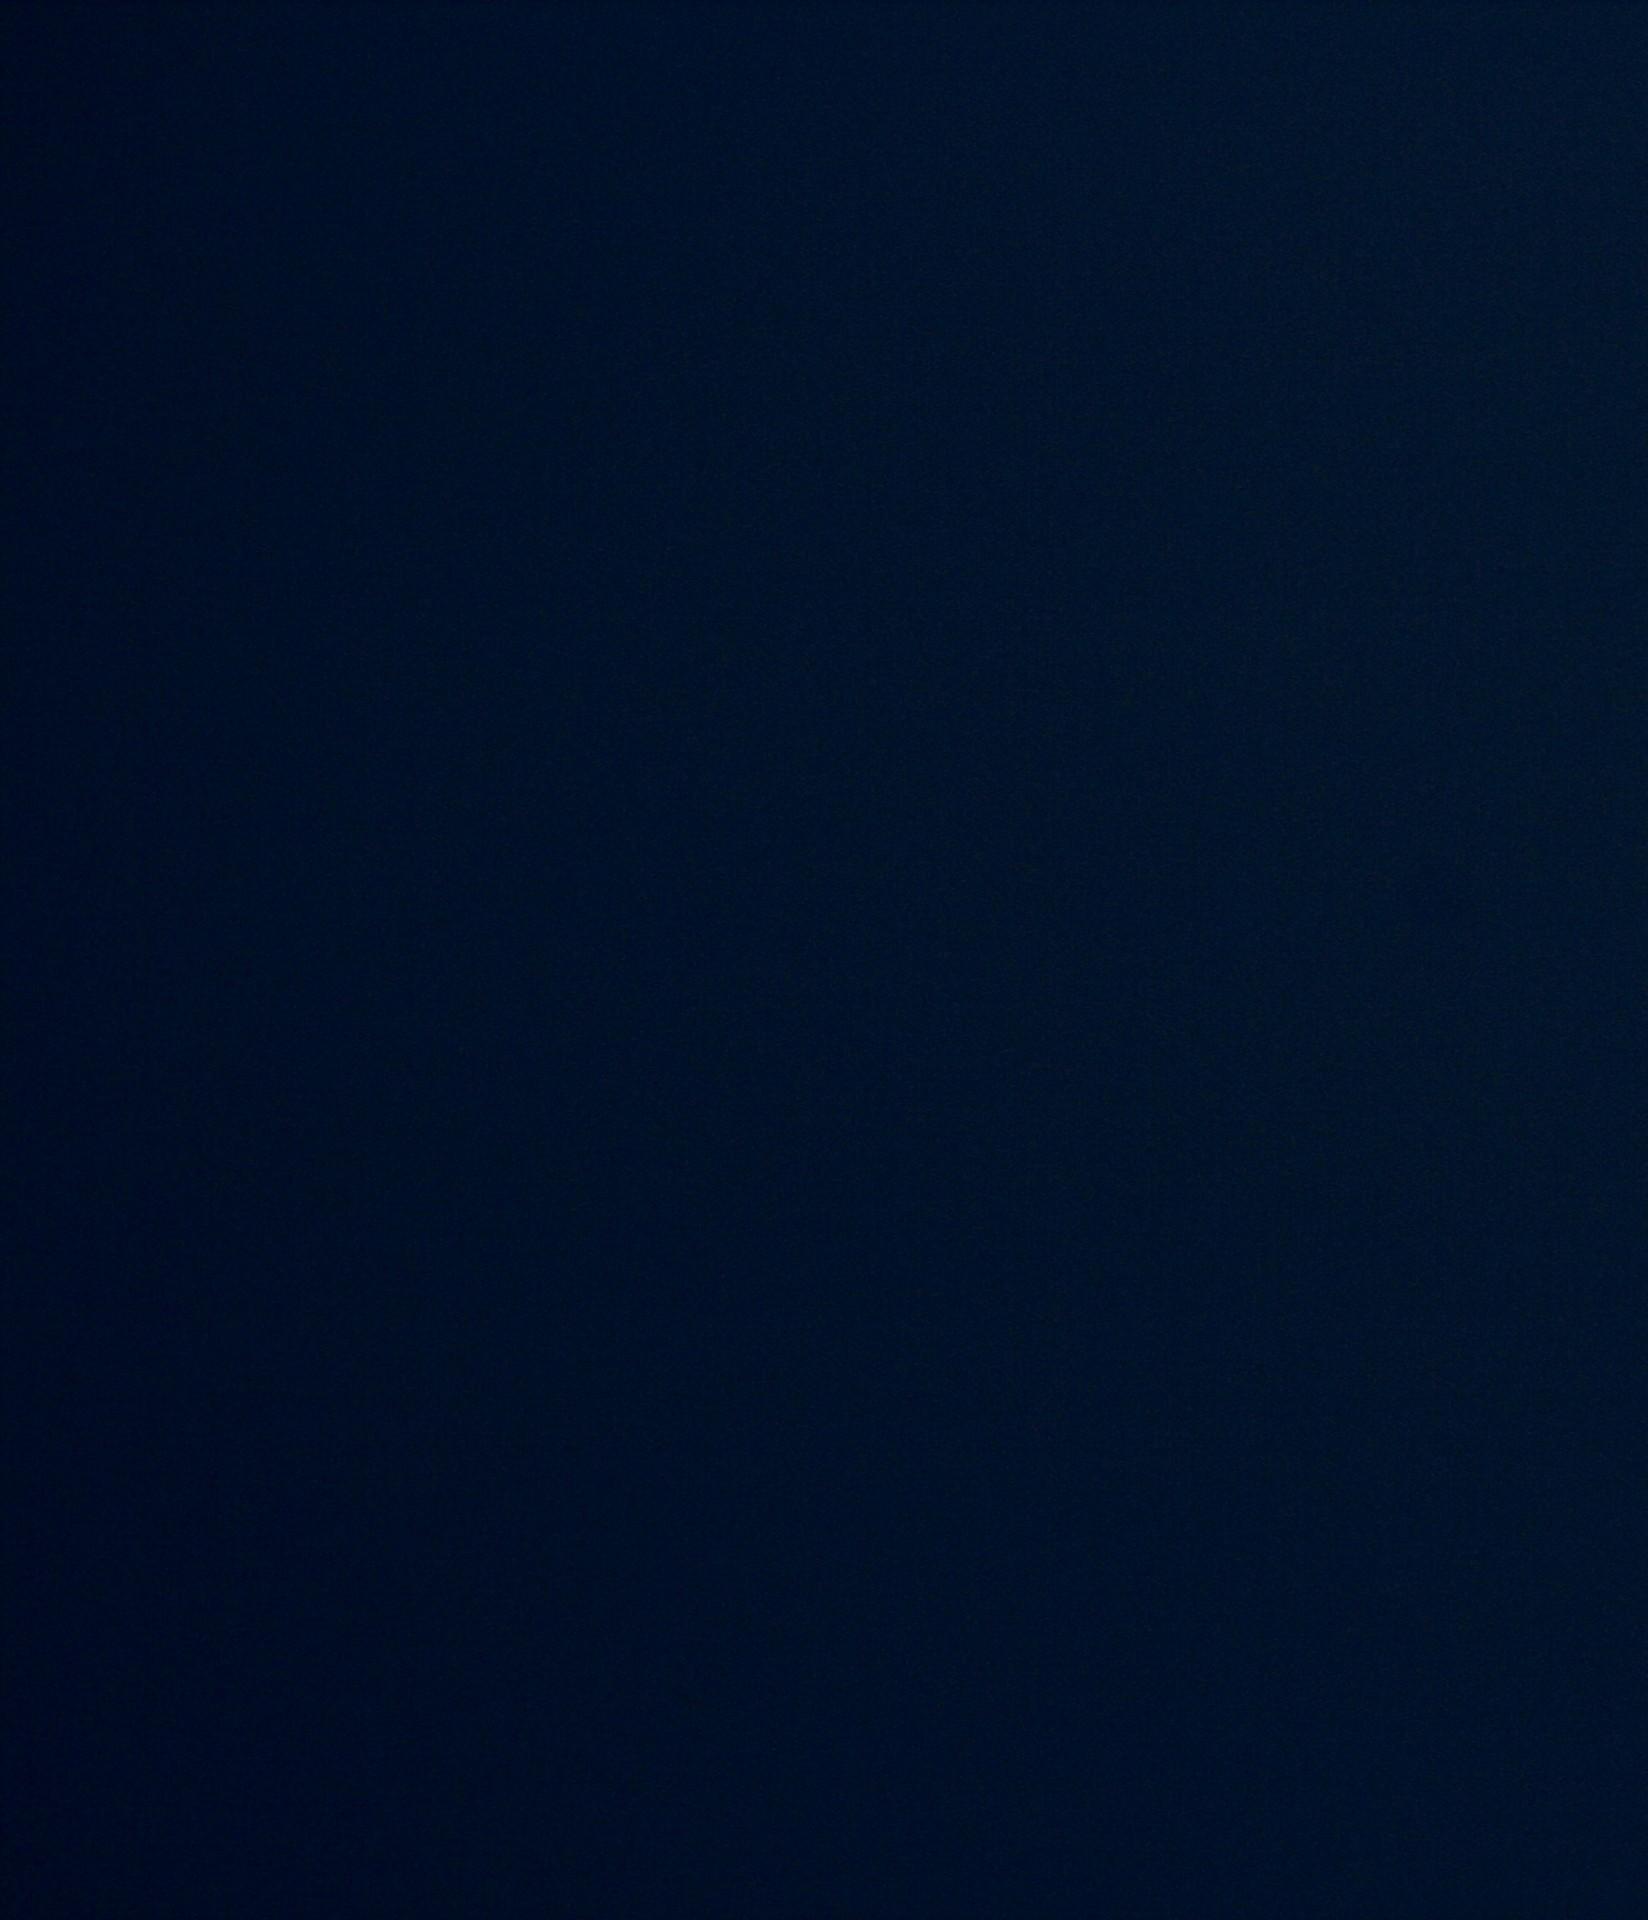 Dark Blue Black Night Sky Even Colored Background Indigo Sky Background Free Image From Needpix Com